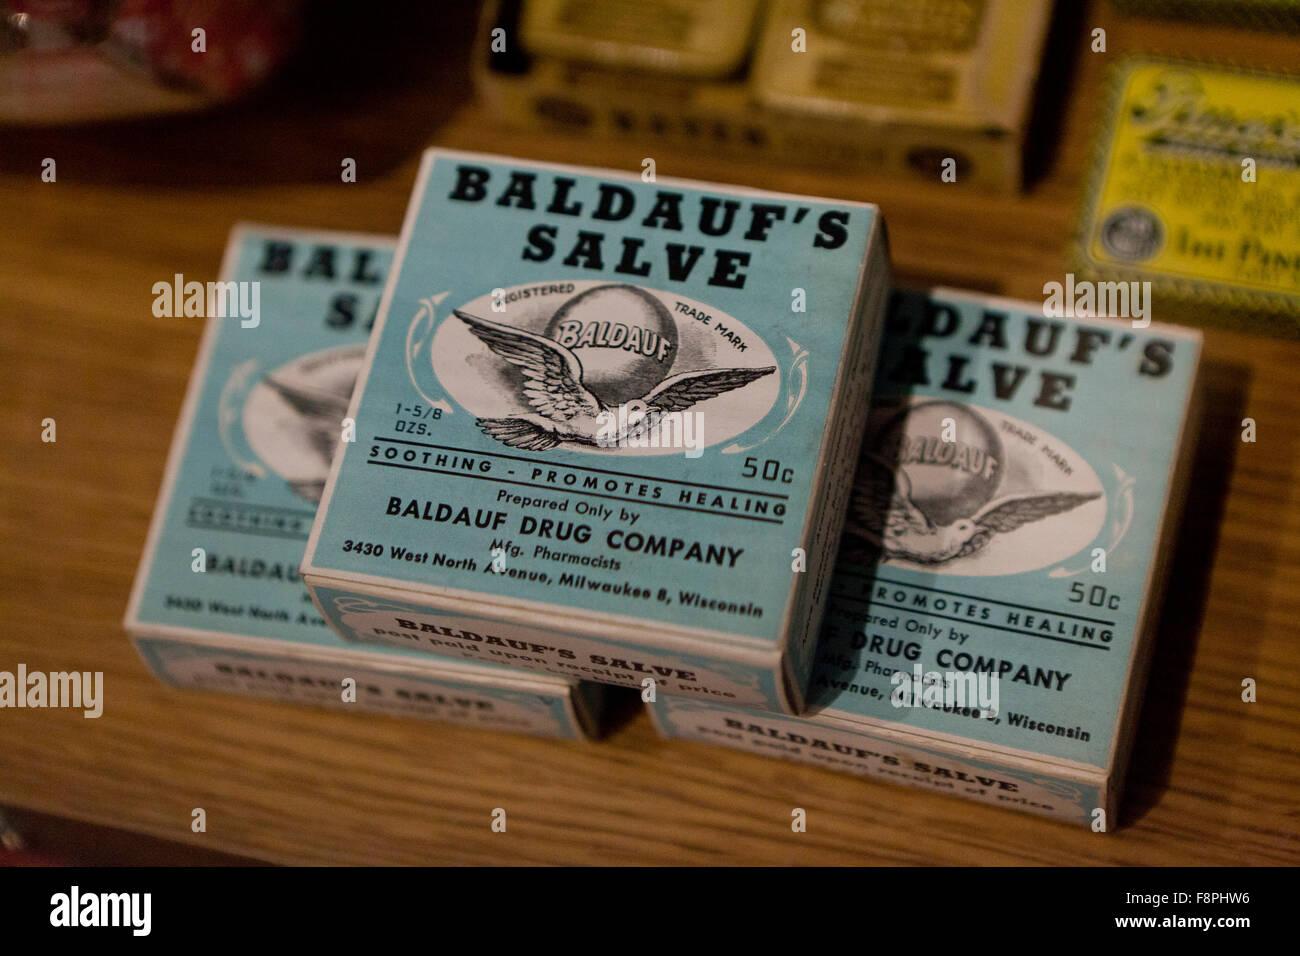 Vintage Baldauf's Healing Salve boxes, early 1900s - USA - Stock Image